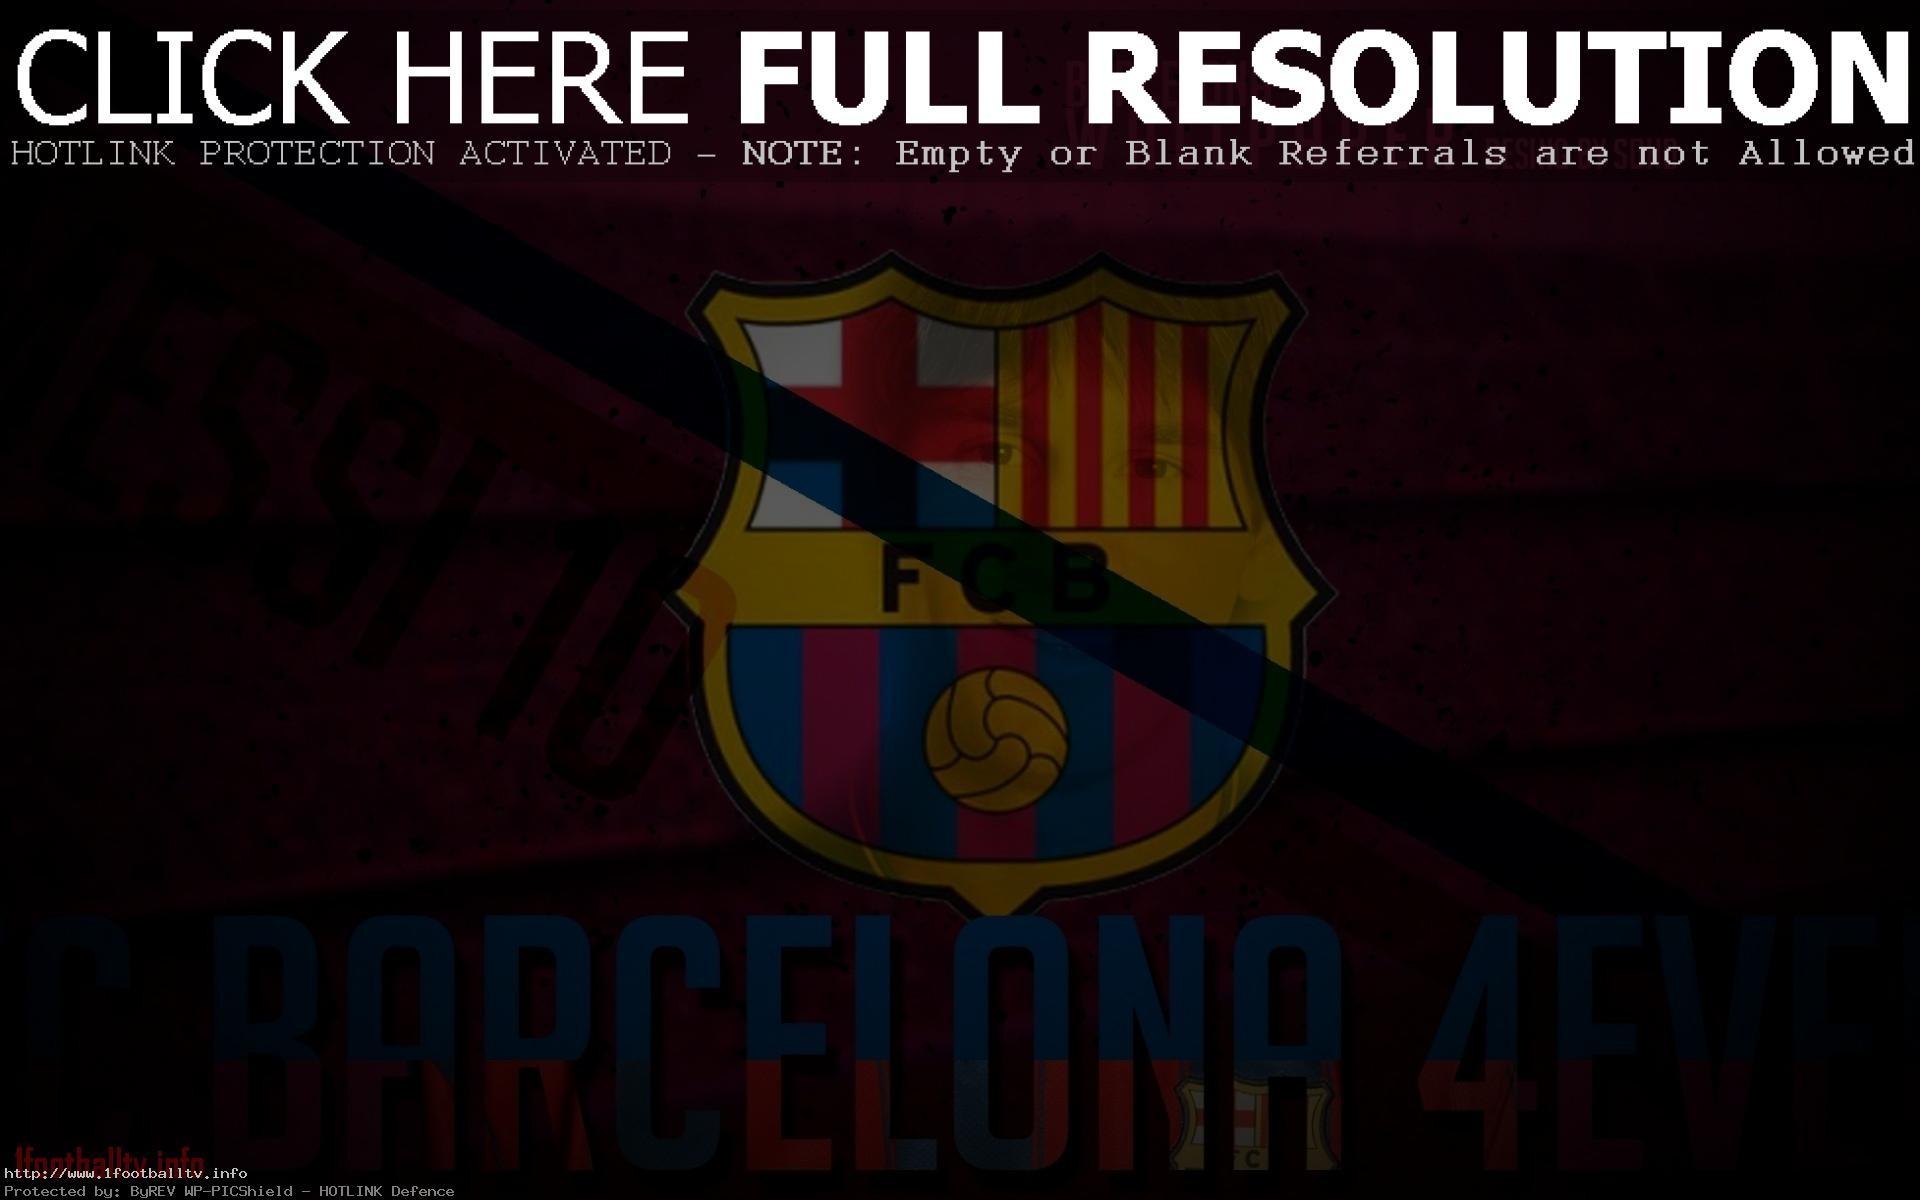 fc barcelona wallpaper hd iphone lovely barcelona soccer sports blaugrana  logos wallpapers football wallpaper of fc